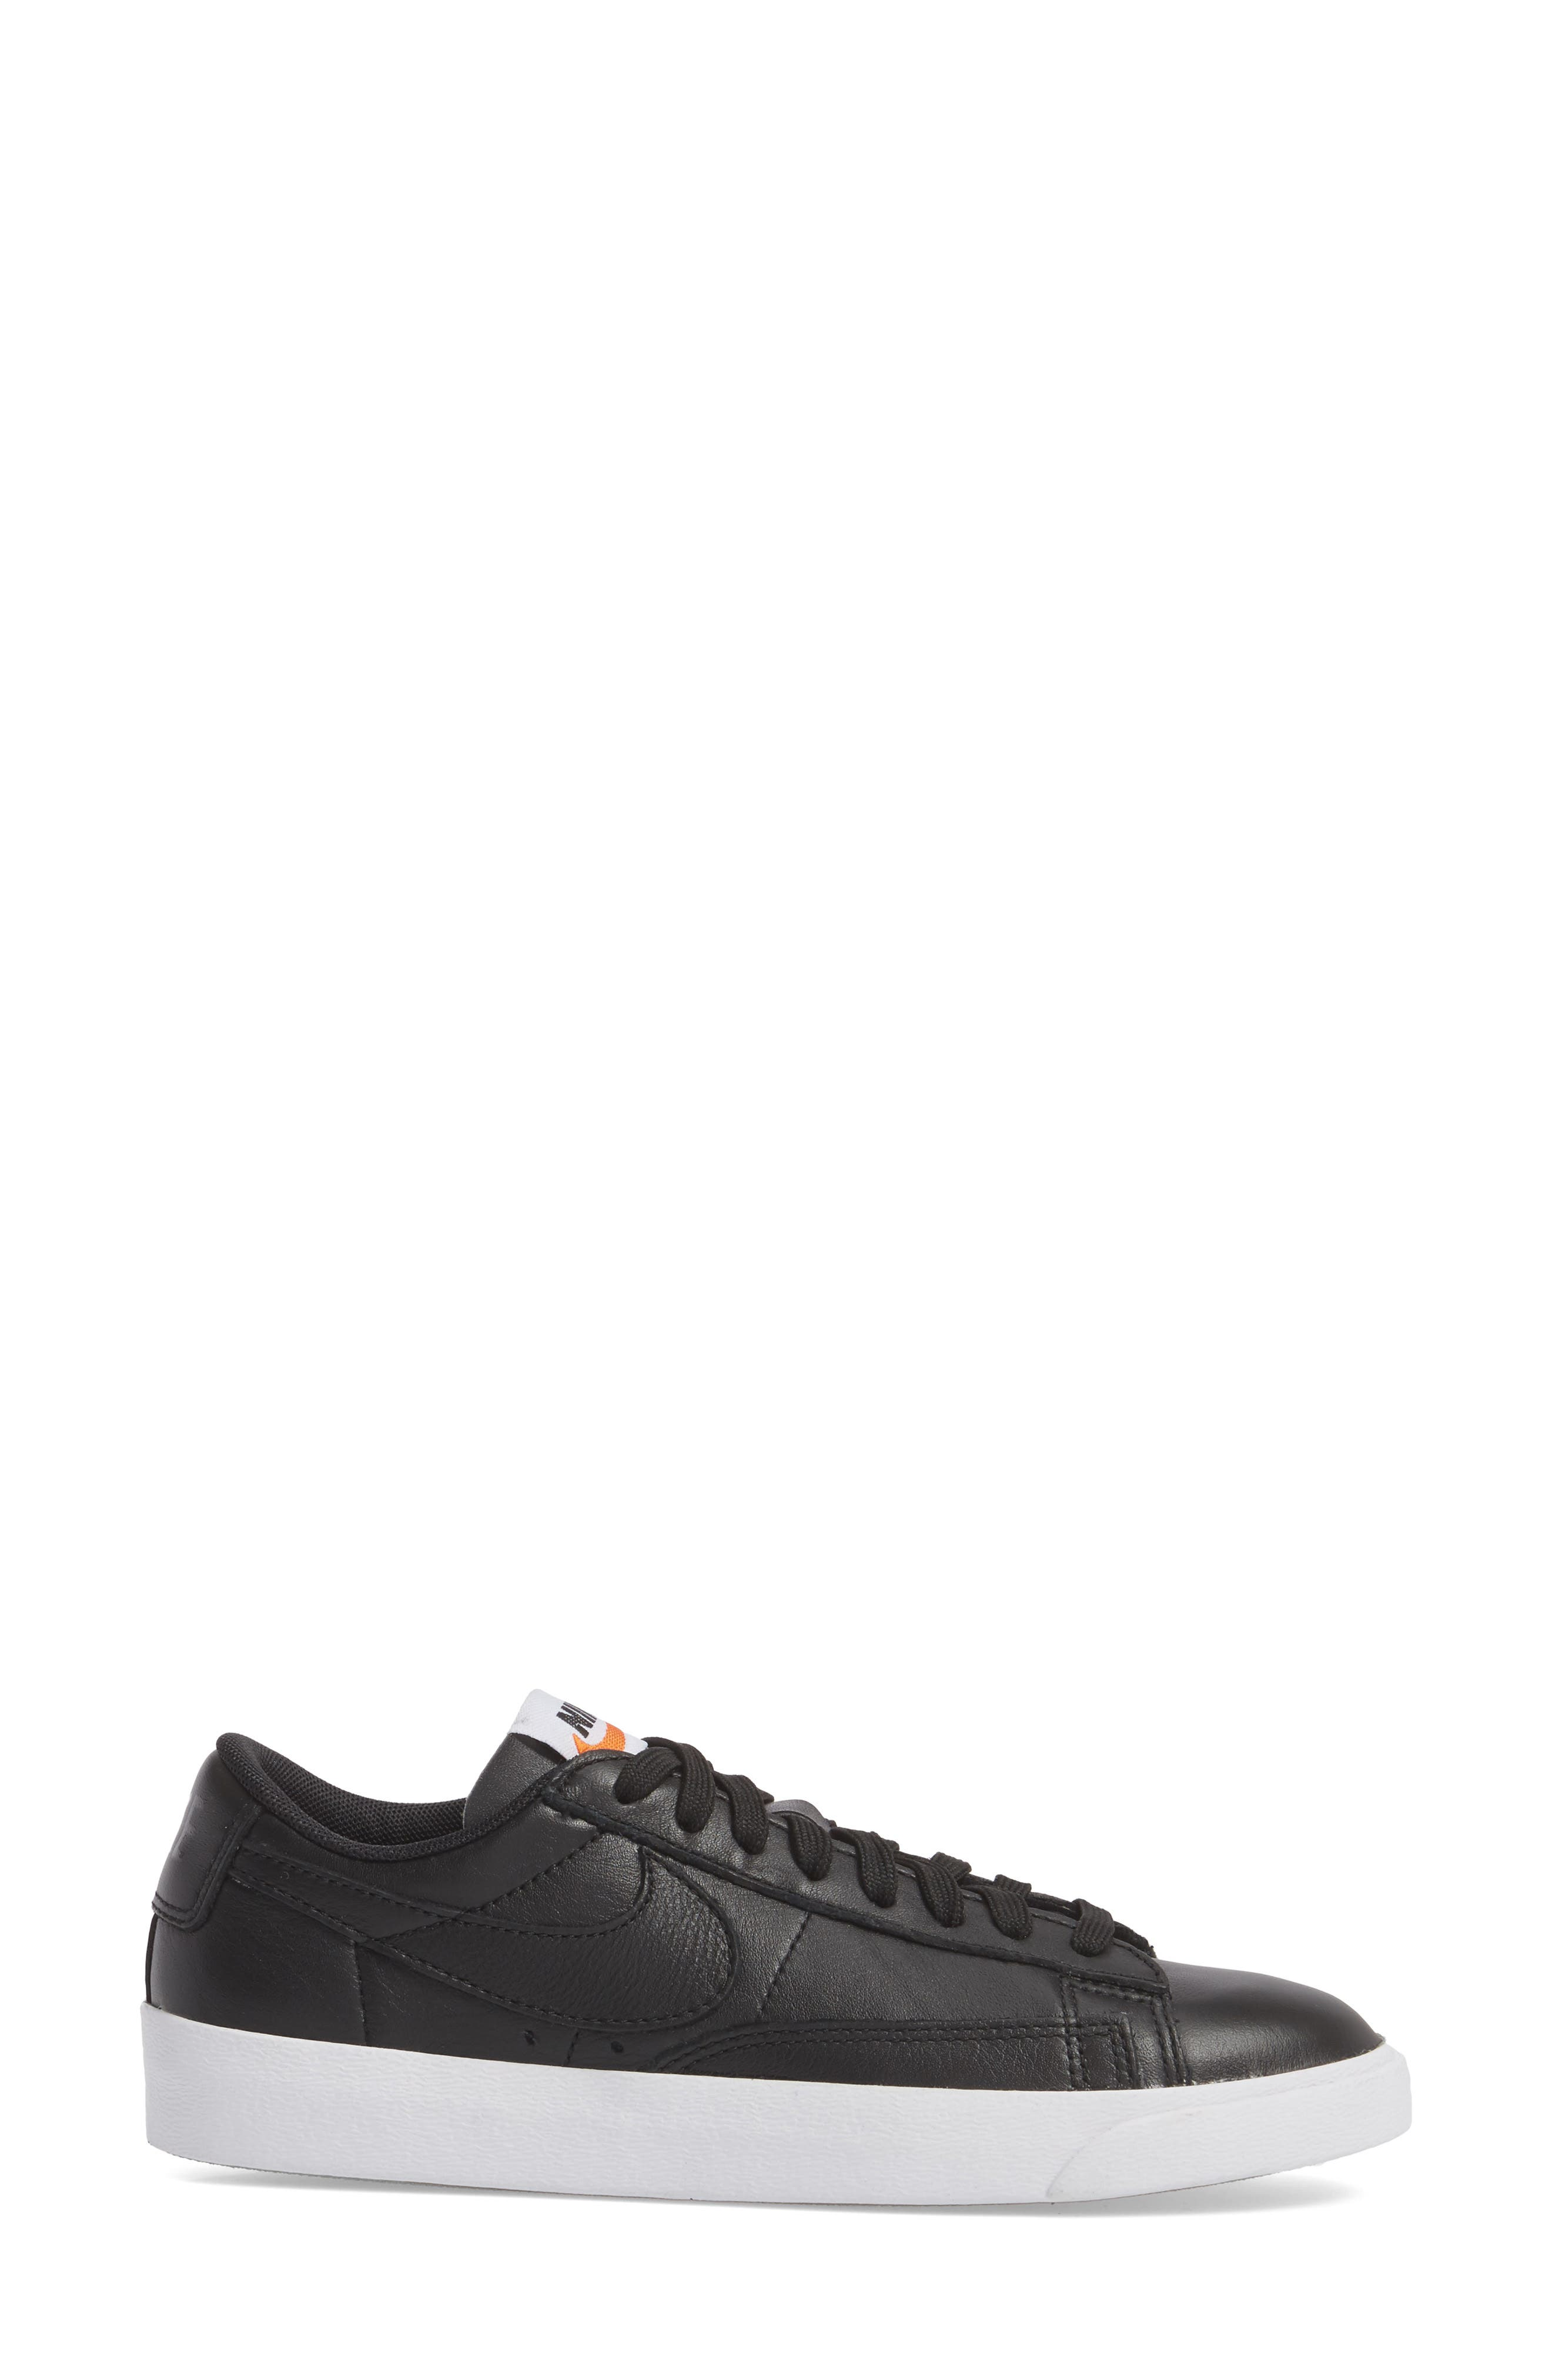 NIKE,                             Blazer Low LE Basketball Shoe,                             Alternate thumbnail 3, color,                             001